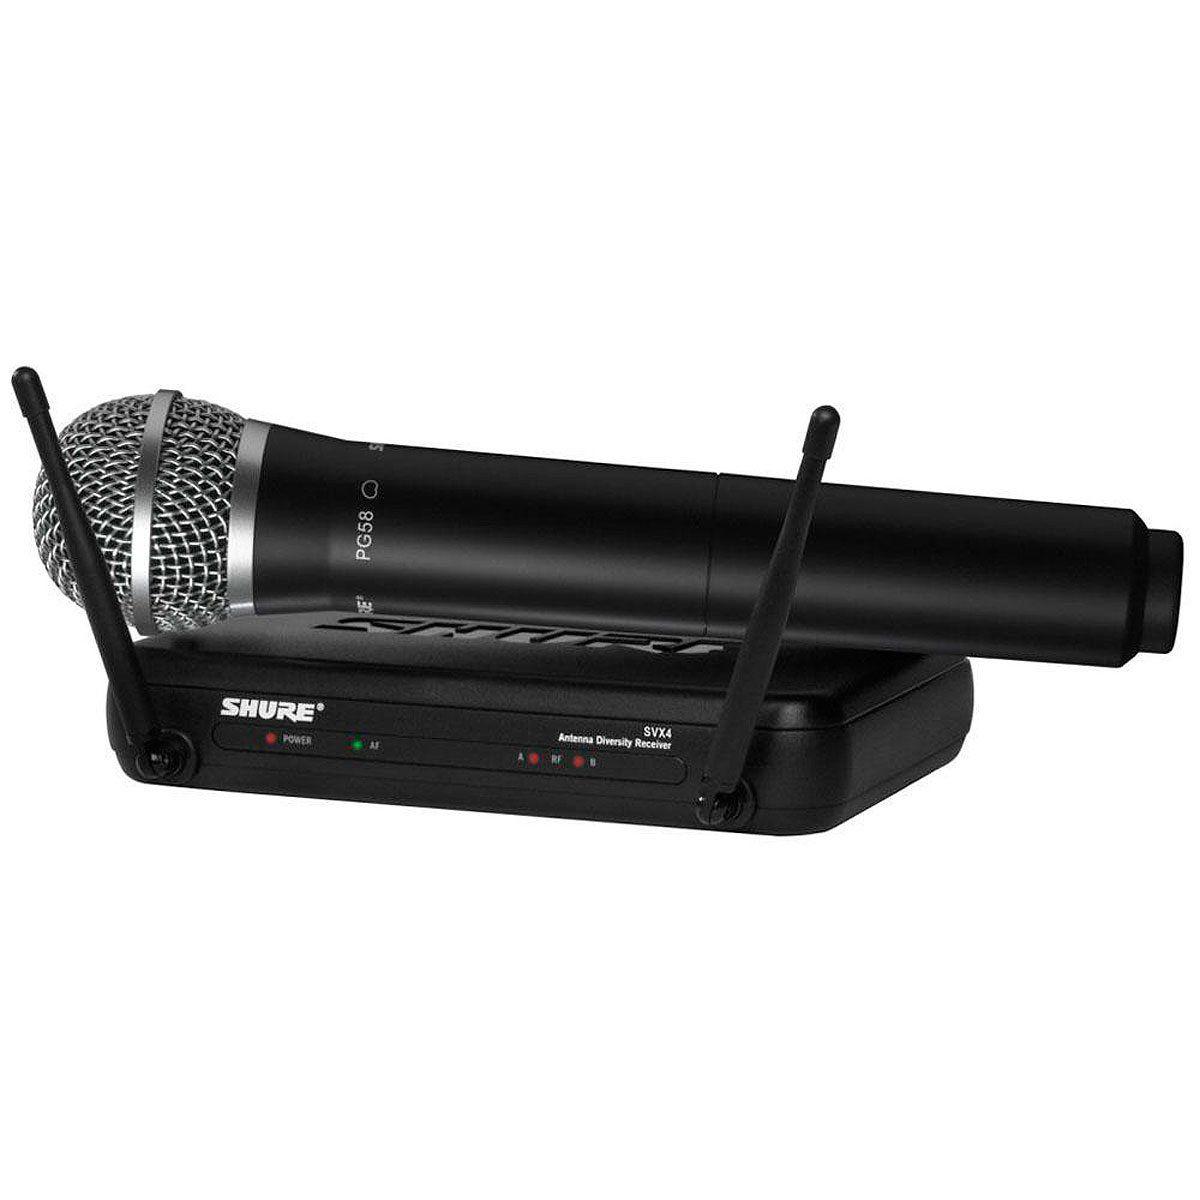 Microfone Shure Sem Fio Svx24 Br - Pg 58